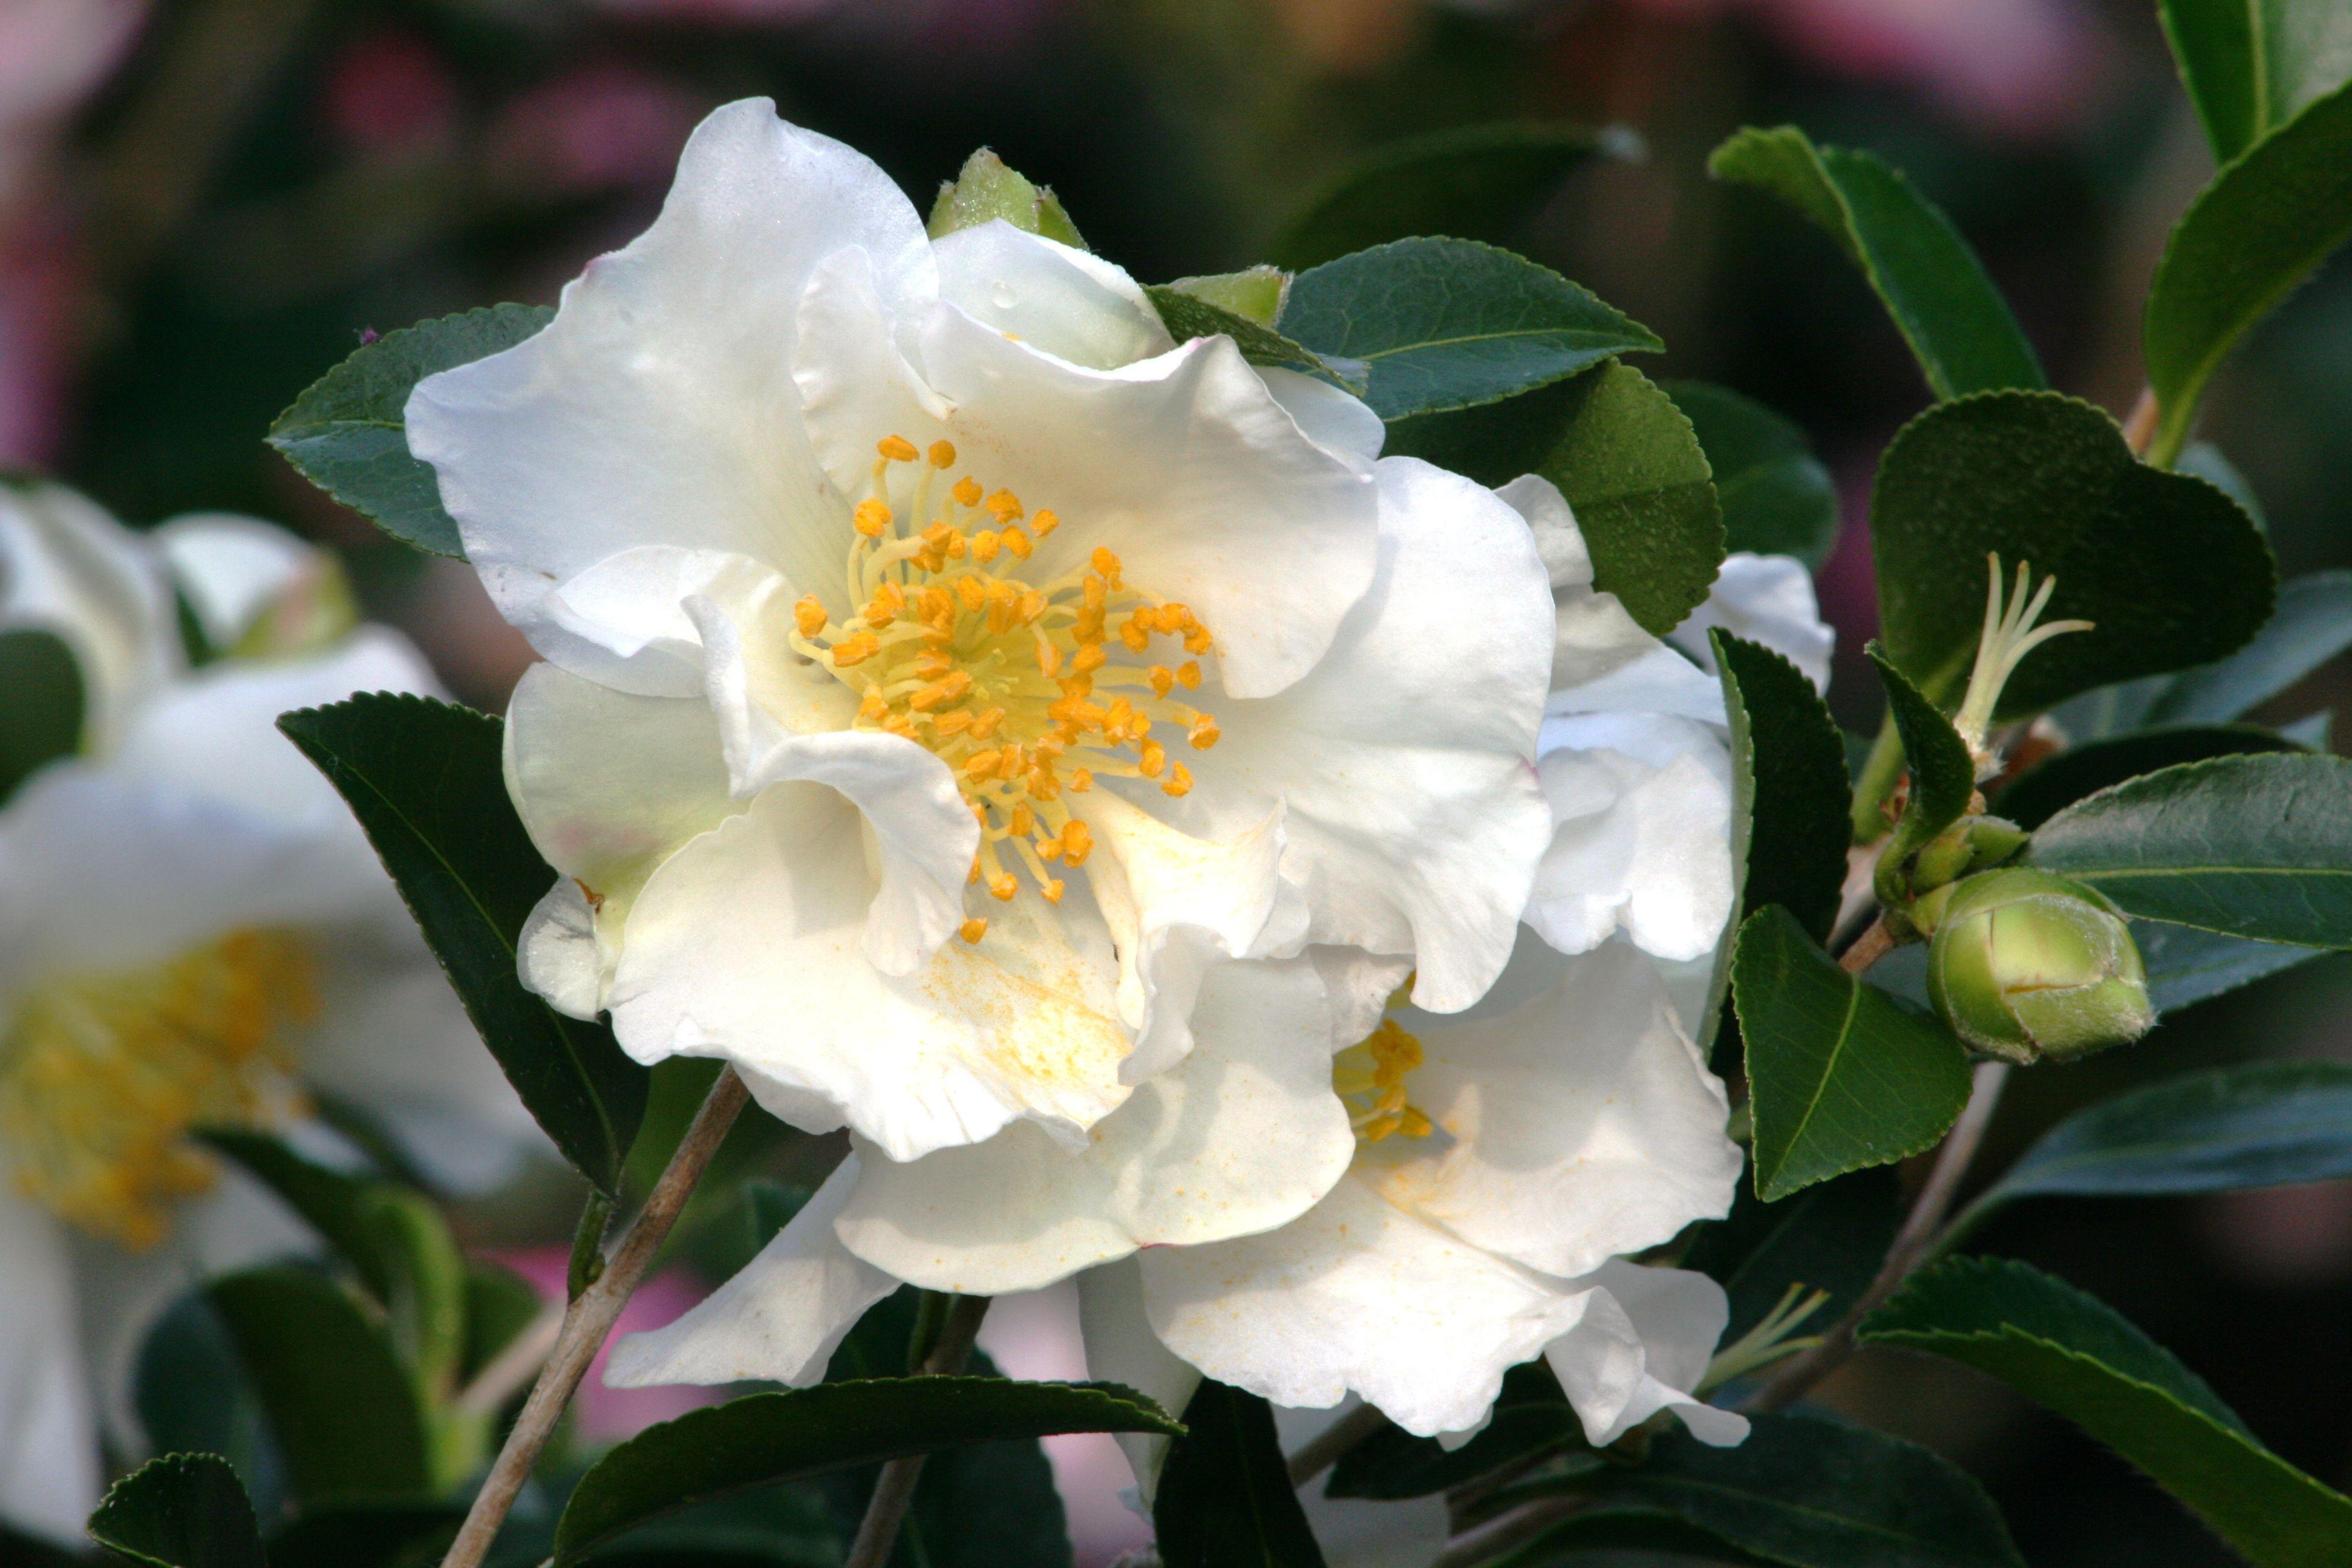 Setsugekka Camellia Monrovia Setsugekka Camellia Camellia Flower Plants Colorful Garden